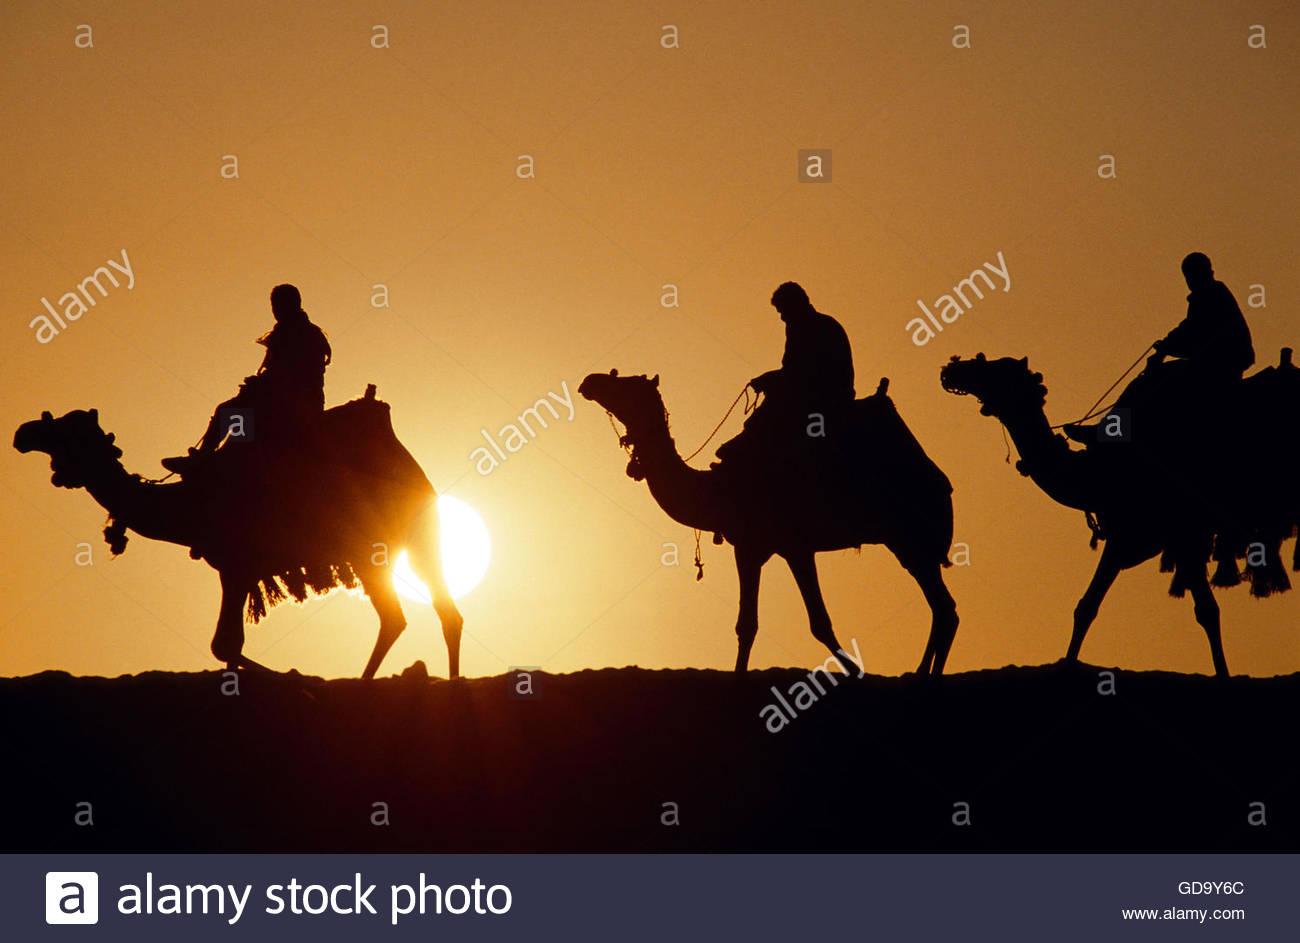 Egypt Camel Caravan at sunset - Stock Image